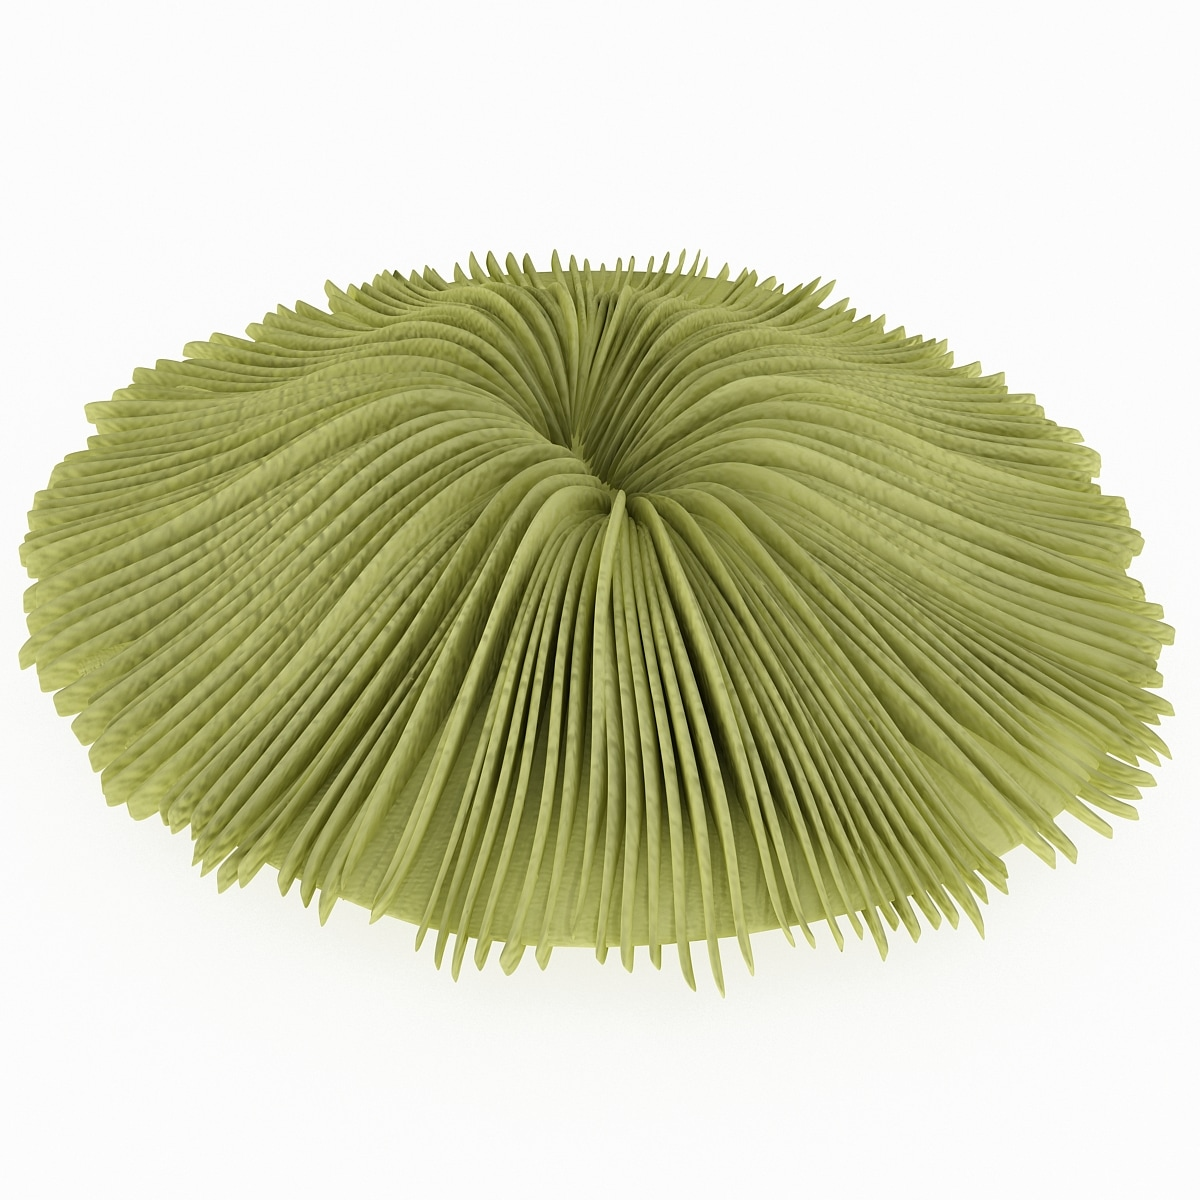 134535_Mushroom_Coral_2_005.jpg